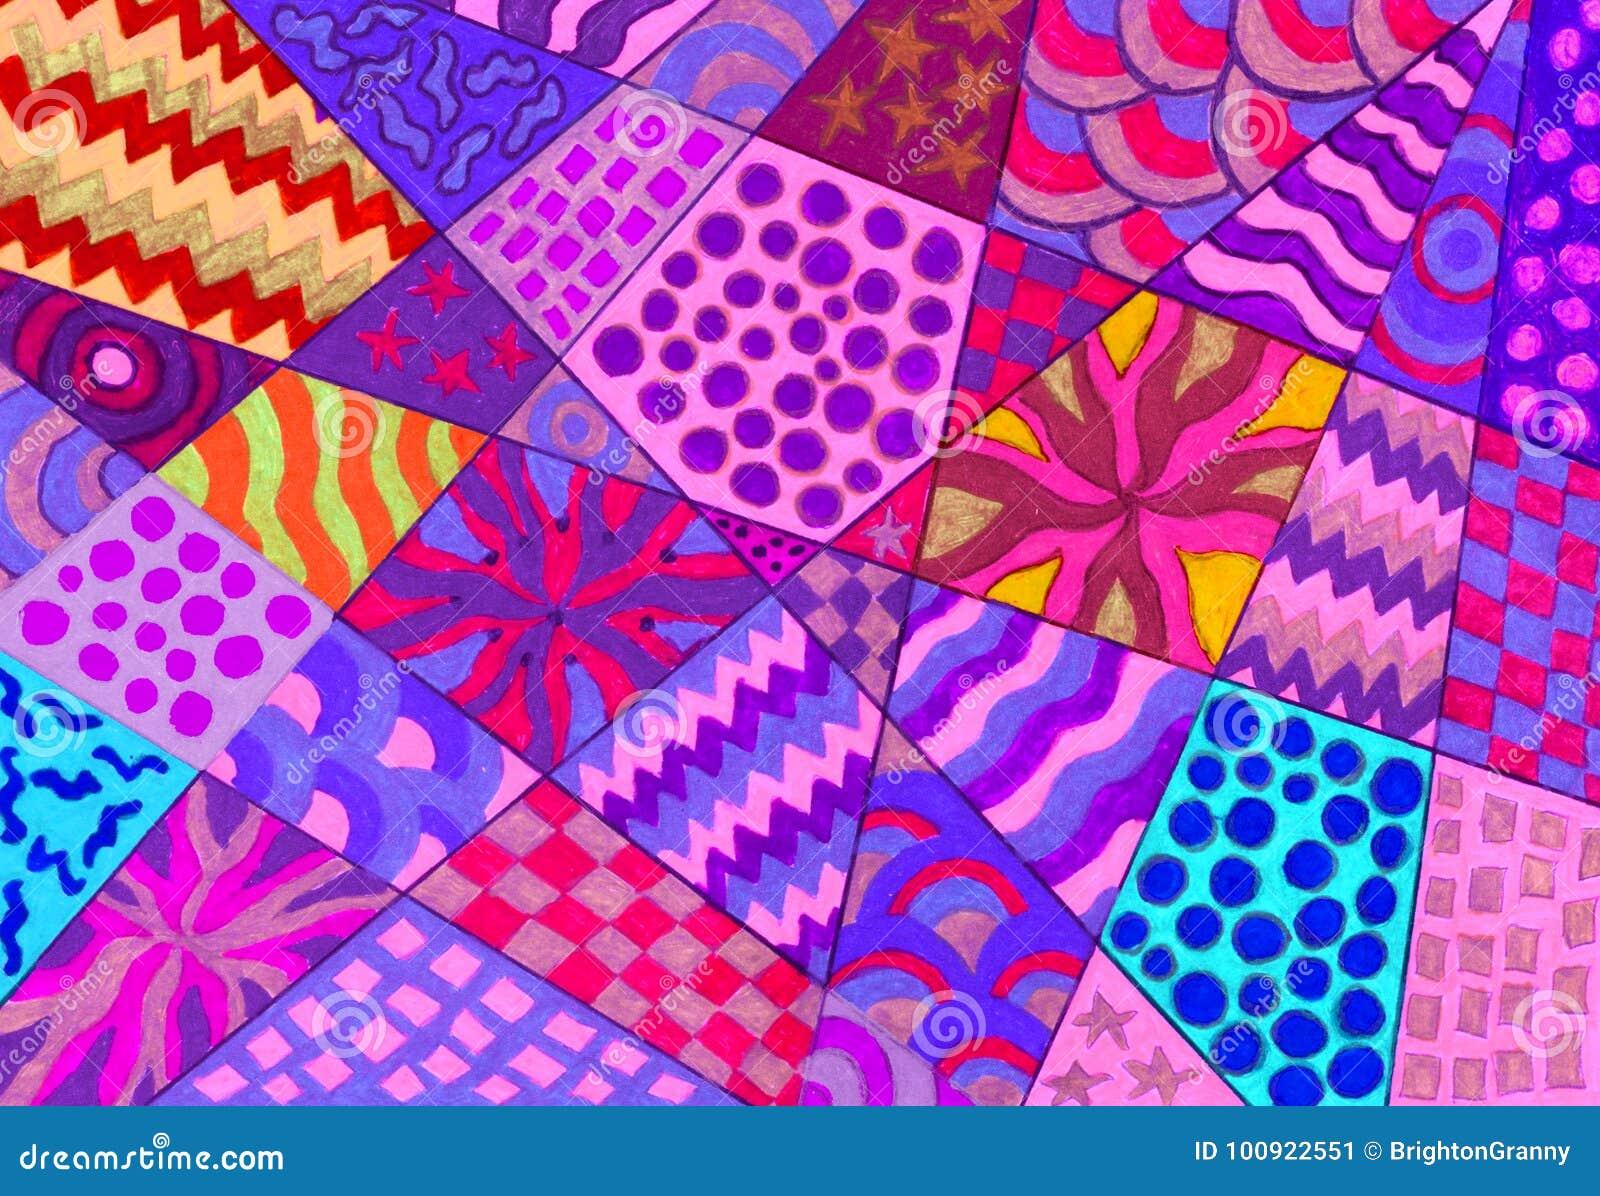 Many sorts of patterns  stock illustration  Illustration of